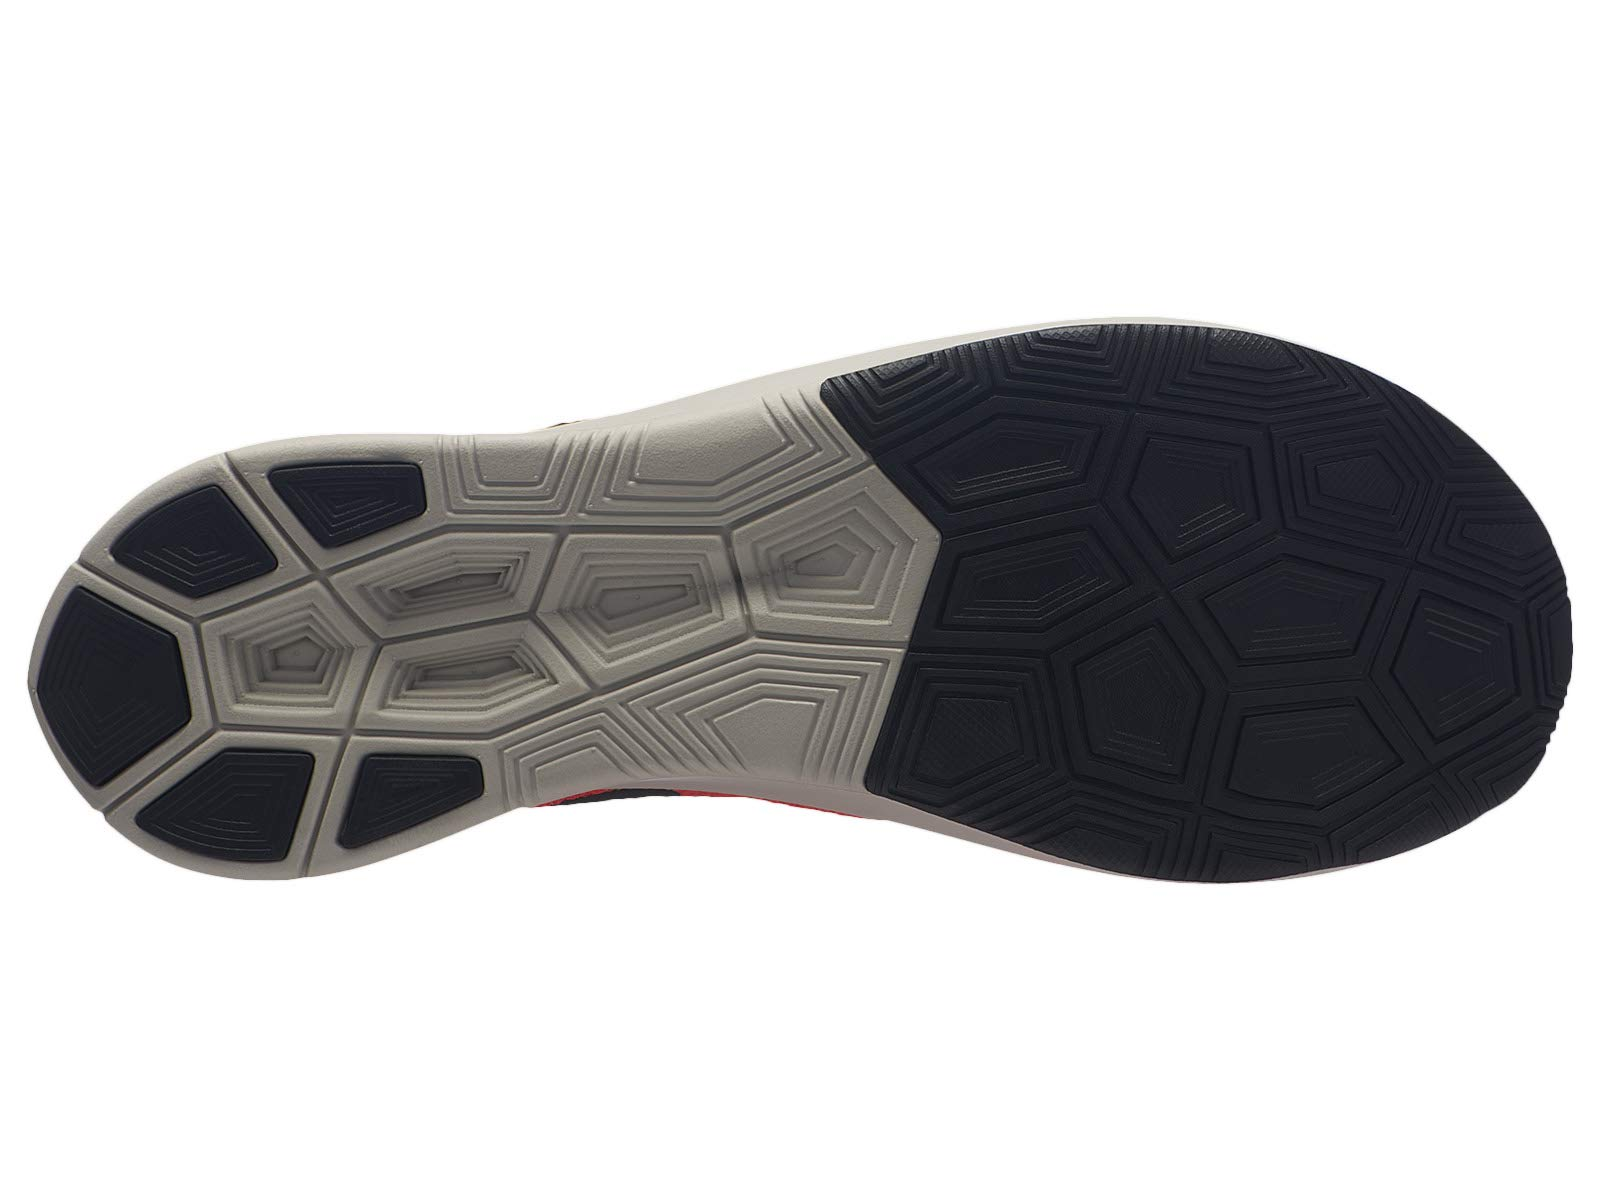 Nike Zoom Fly Flyknit Men's Running Shoe Bright Crimson/Black-Total Crimson Size 8 by Nike (Image #2)